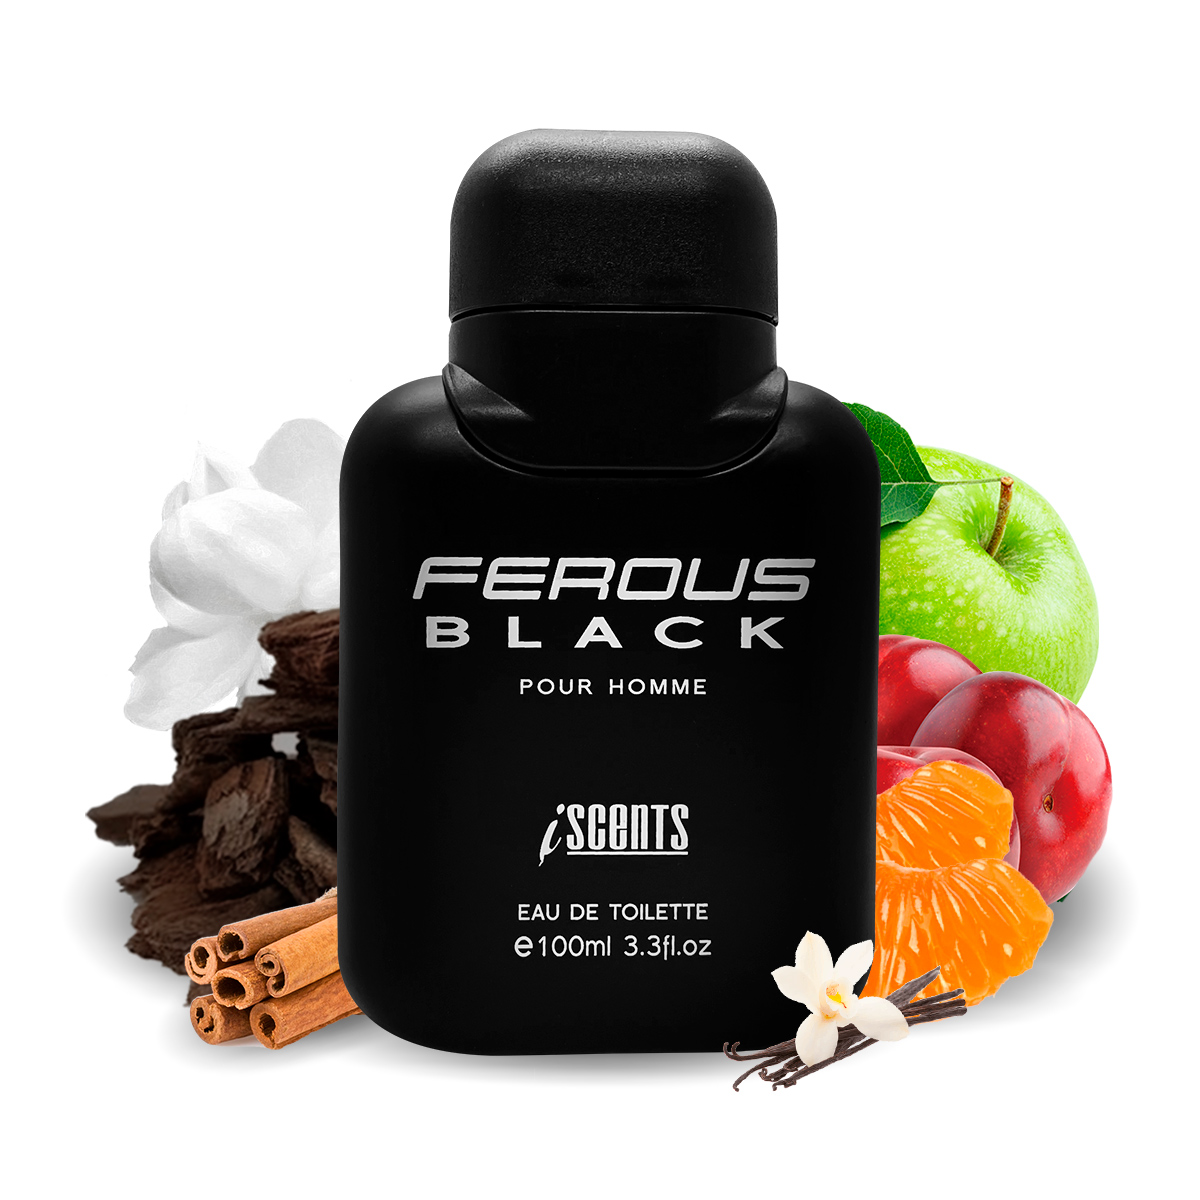 Kit 2 Perfumes Importados Ebon e Ferous Black I Scents